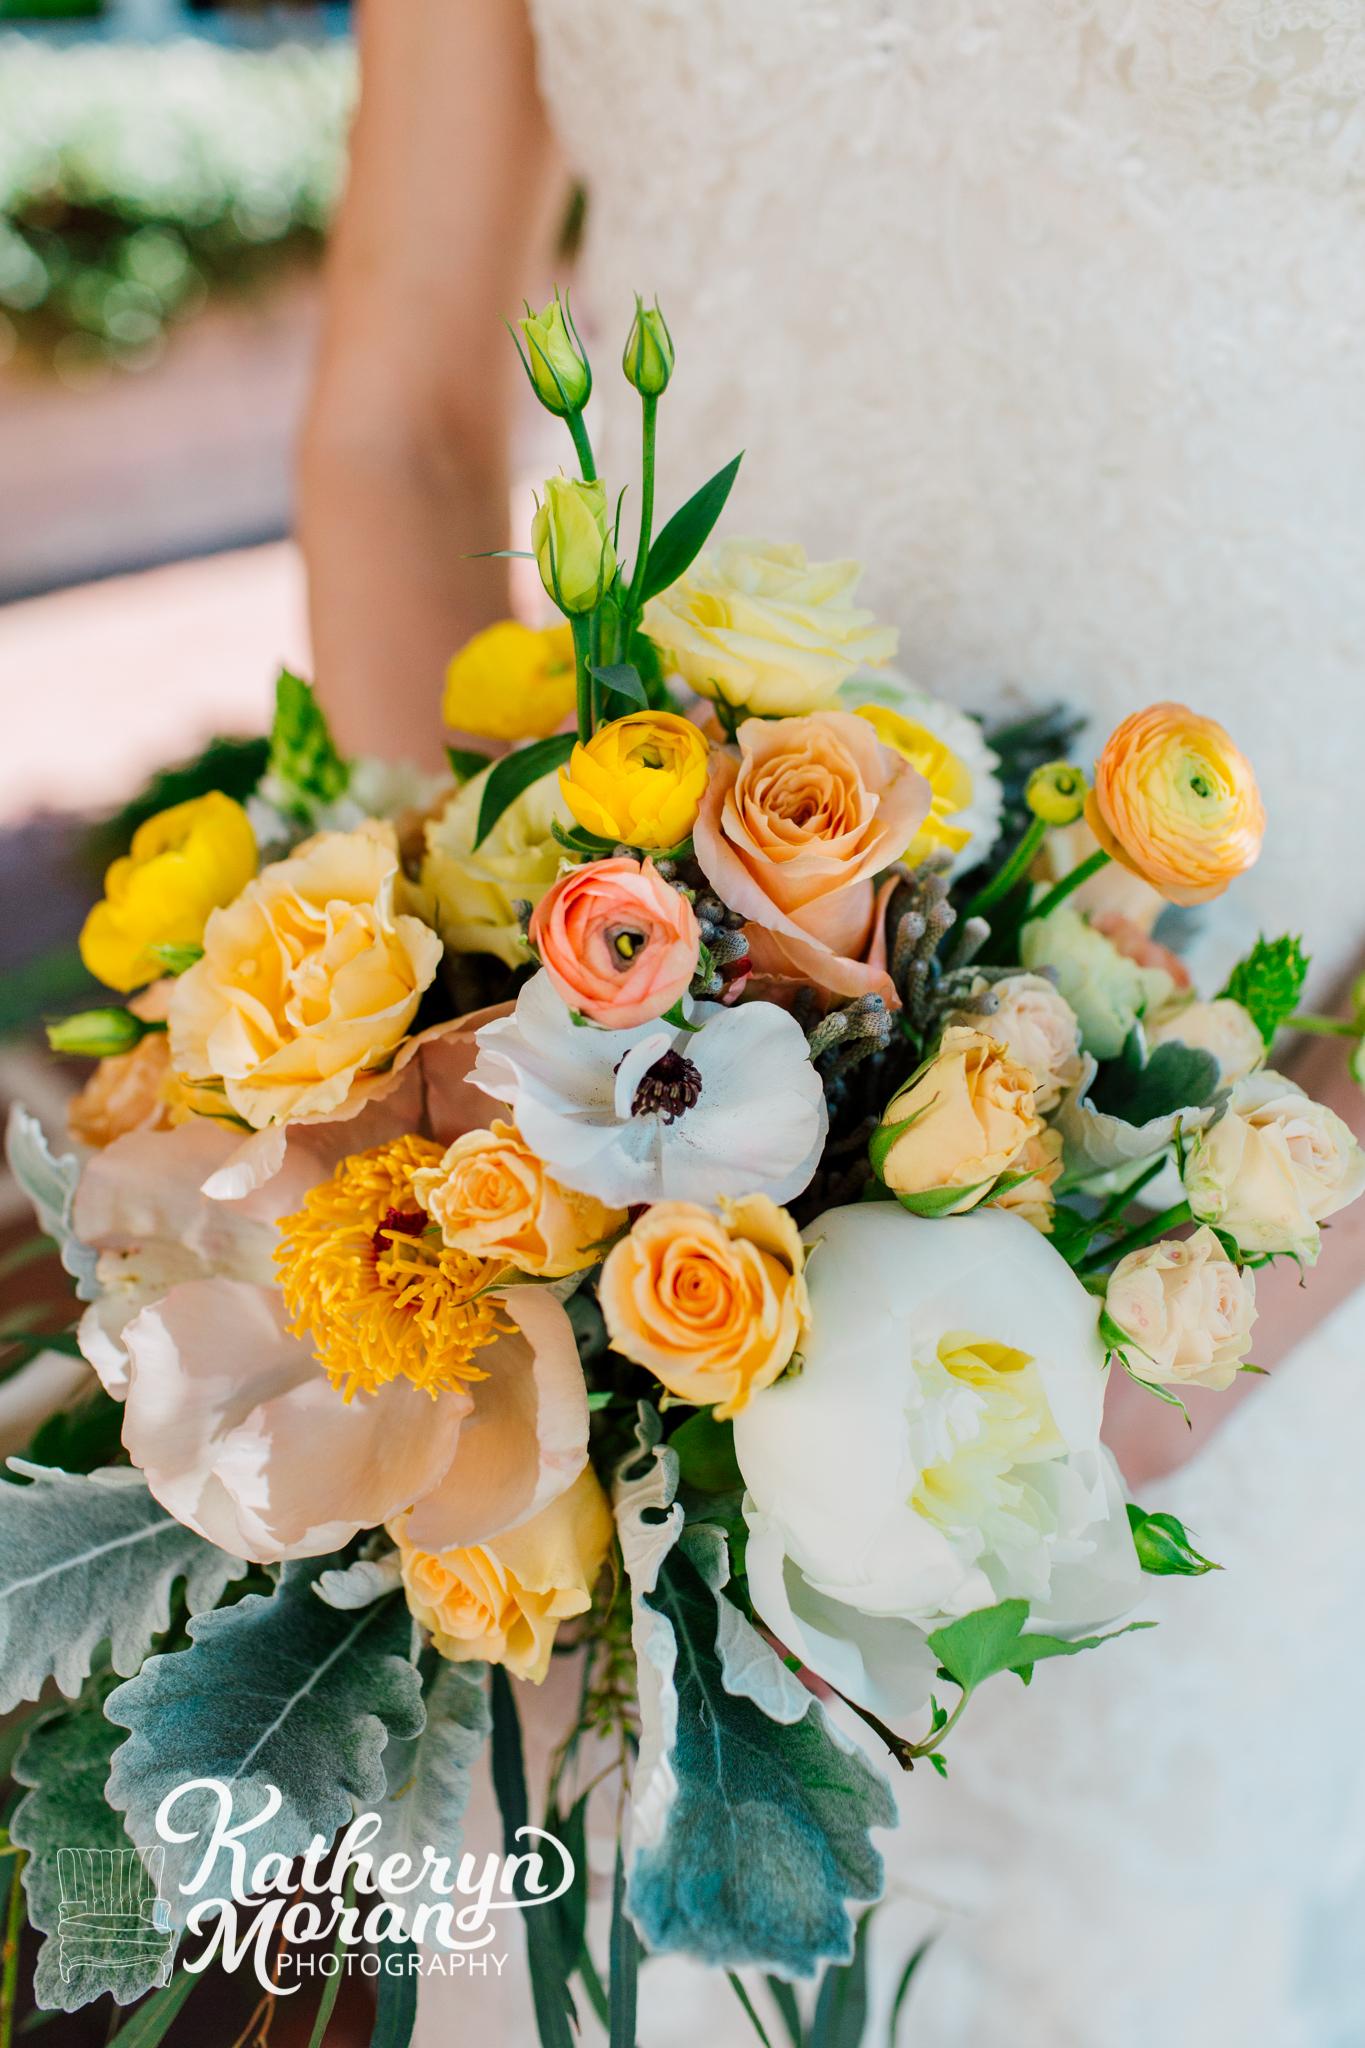 bellingham-wedding-photographer-lairmont-manor-katheryn-moran-4.jpg